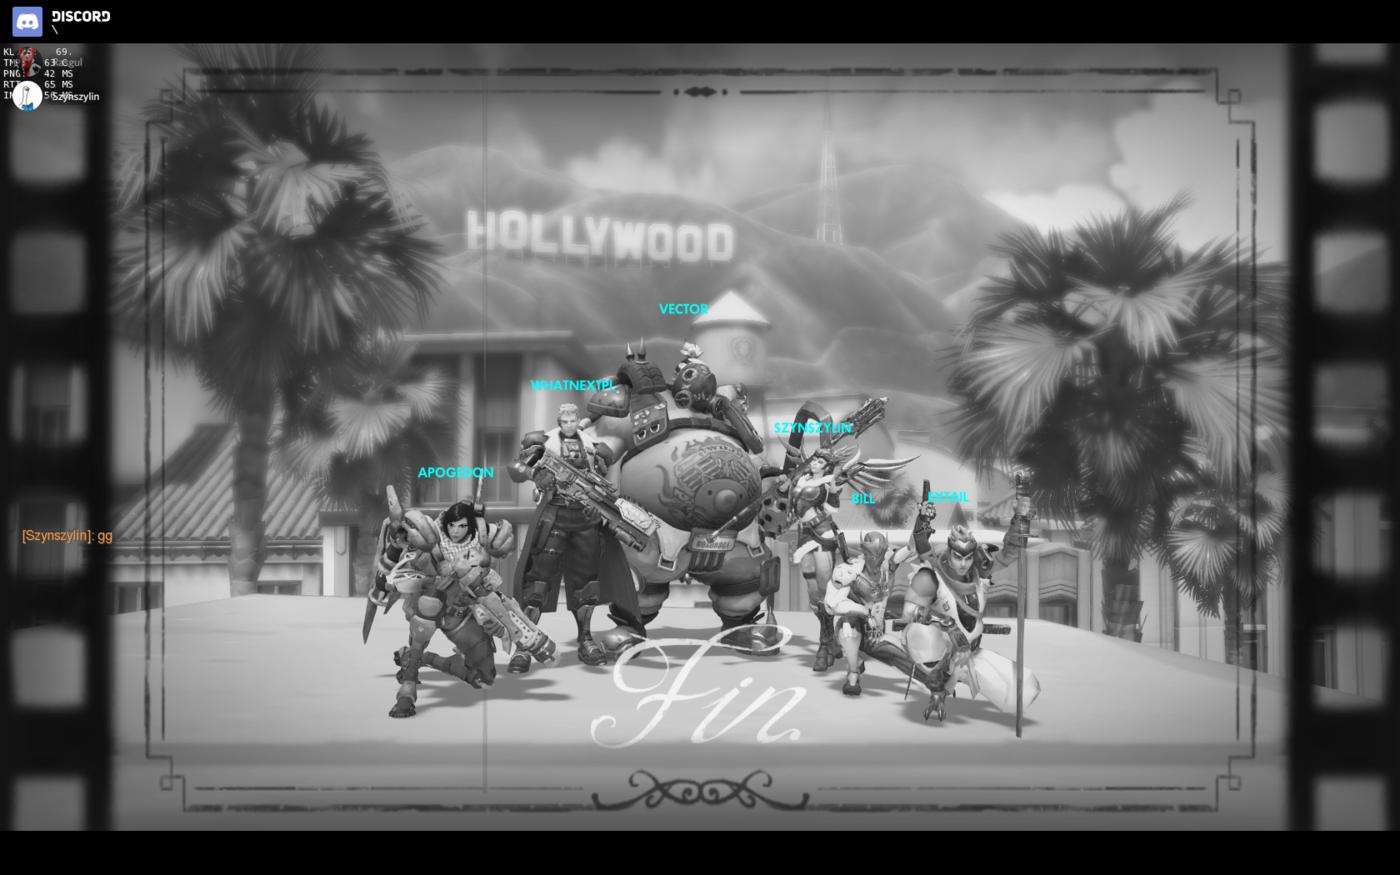 Overwatch 2016-06-28 14-13-13-495